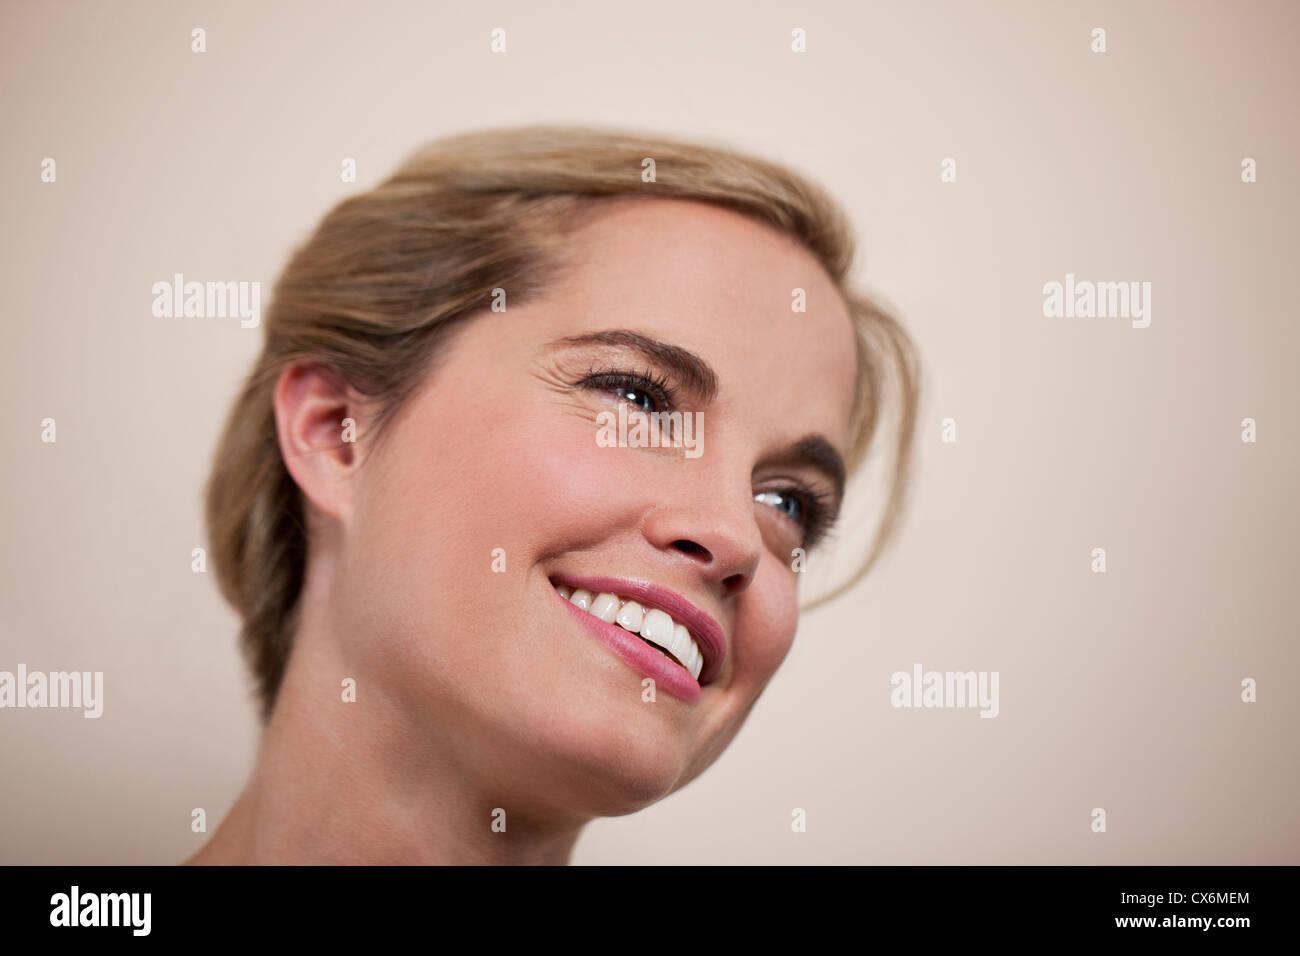 Eine junge Frau wegschauen, Lächeln Stockbild